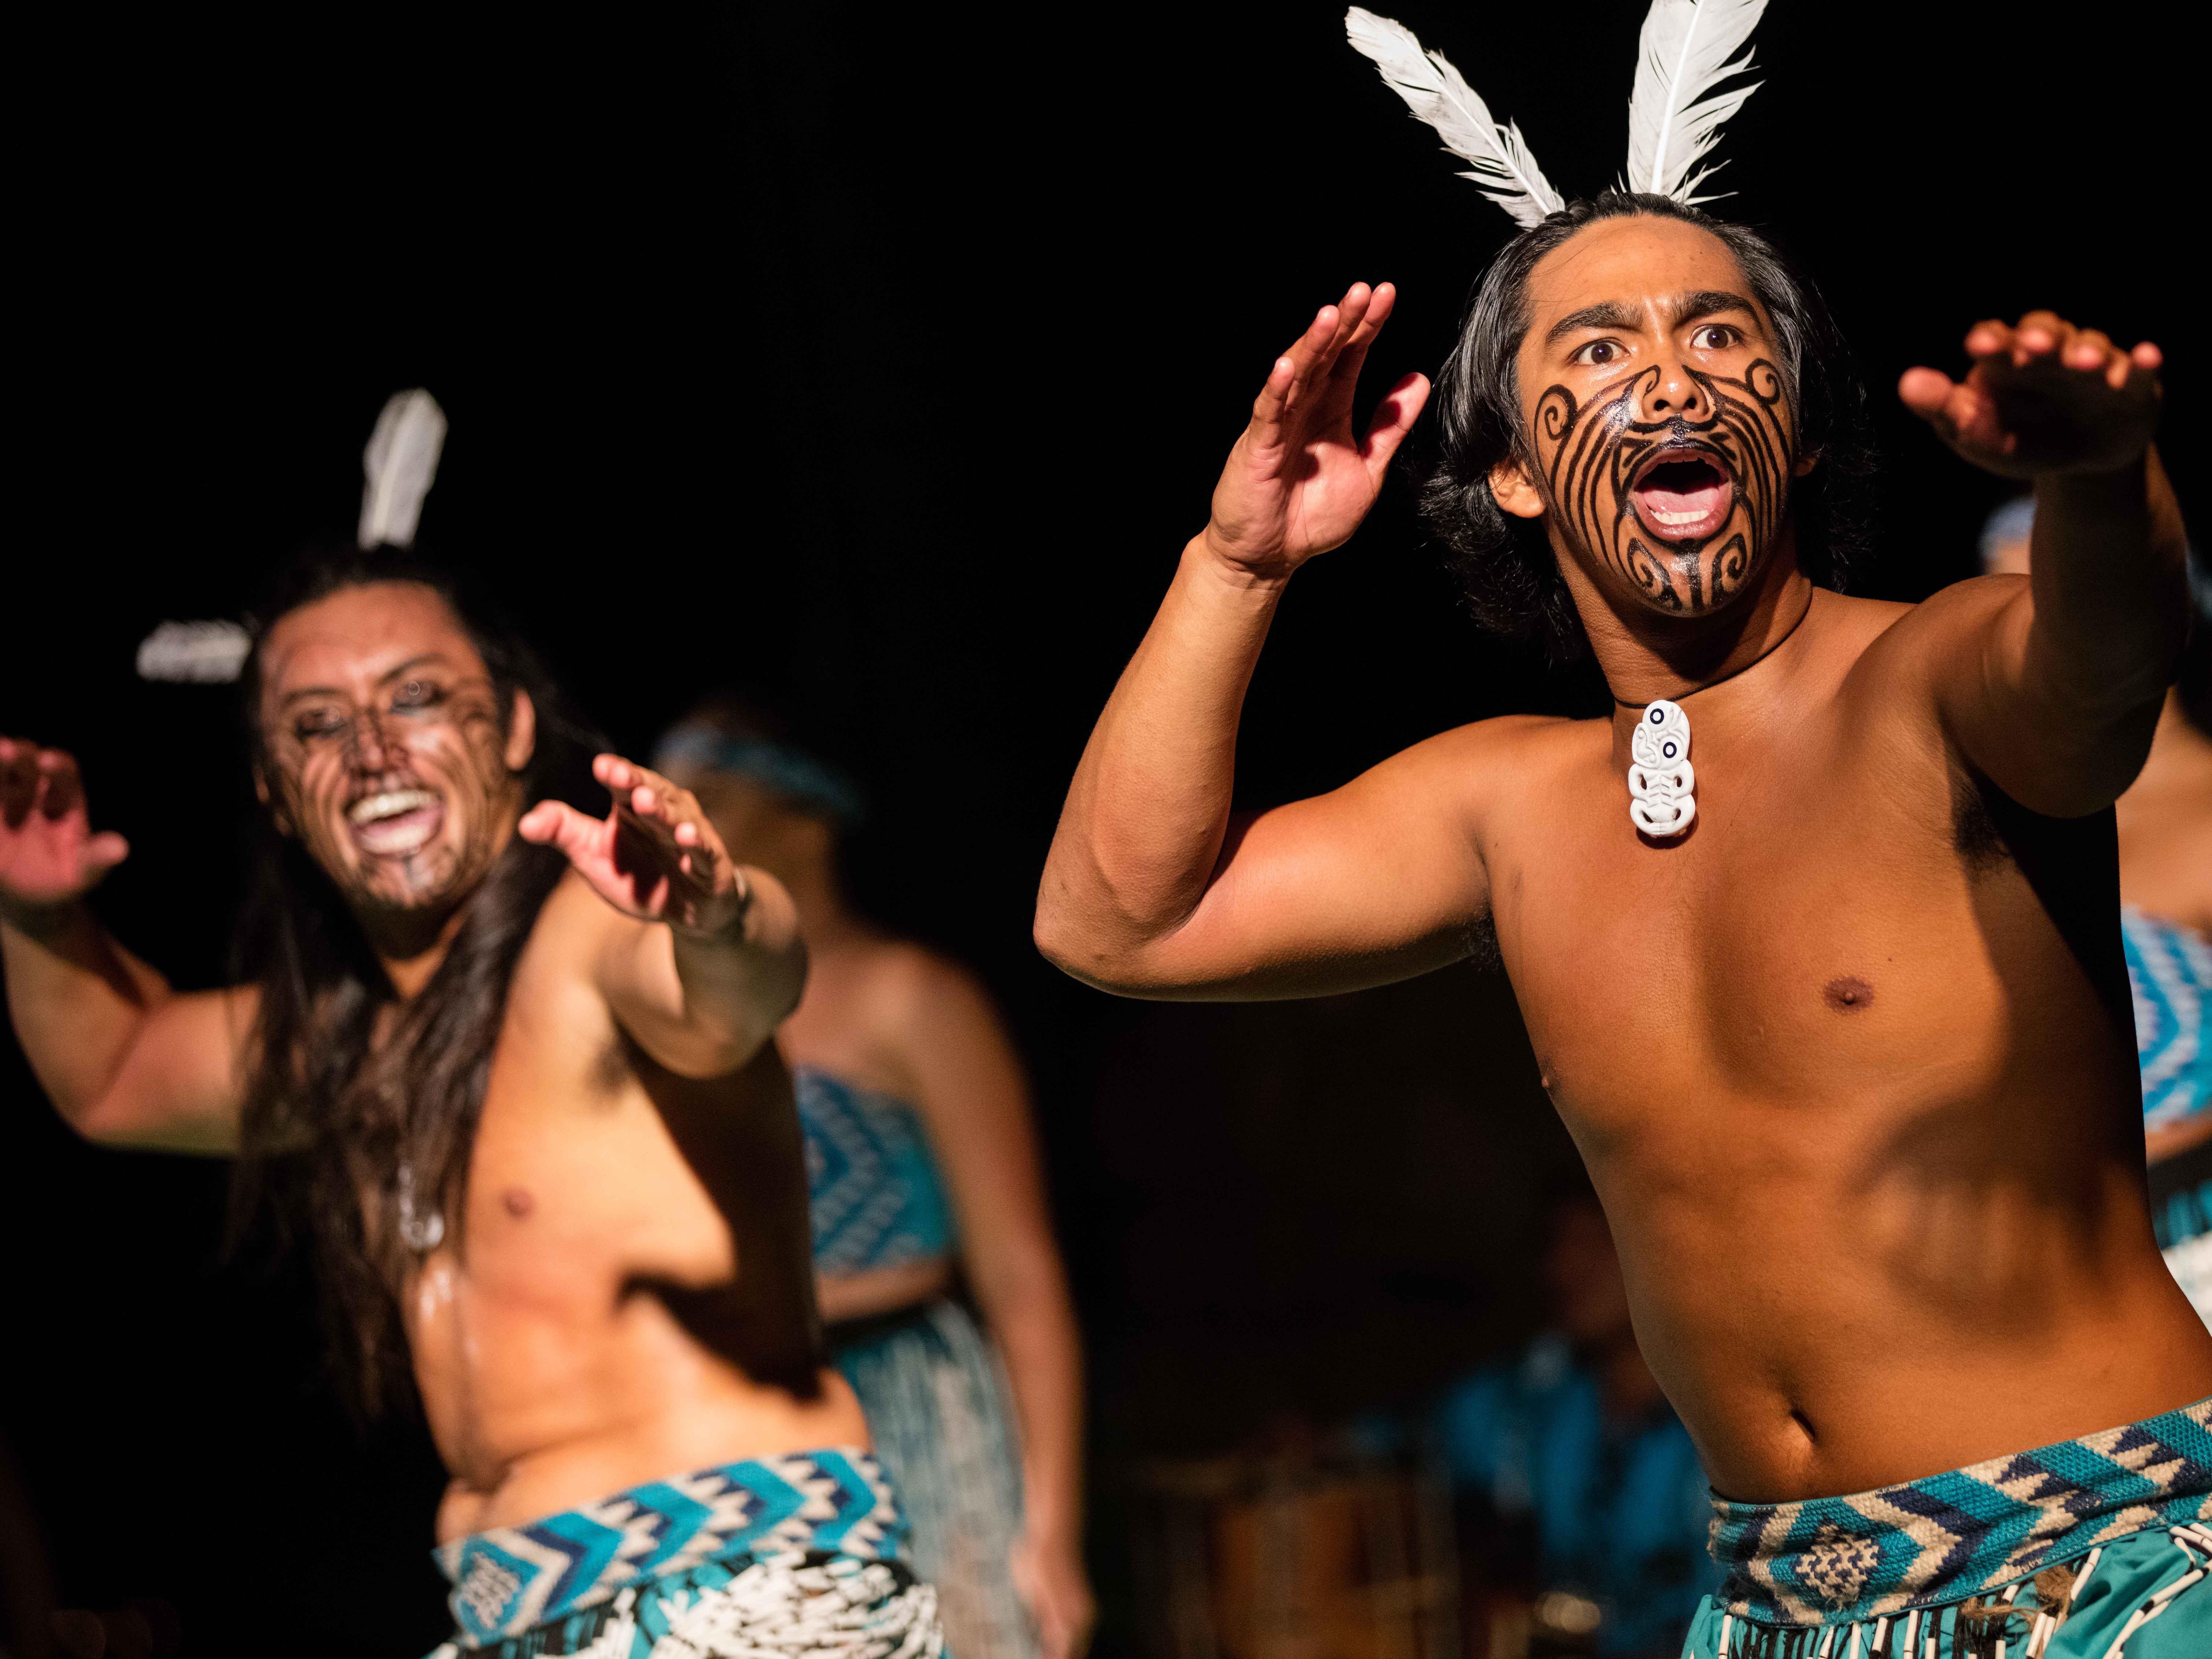 Marriott's Waikoloa Ocean Club Luau Performance. Marriott's Waikoloa Ocean Club is located in Waikoloa Beach, Big Island, Hawai'i United States.